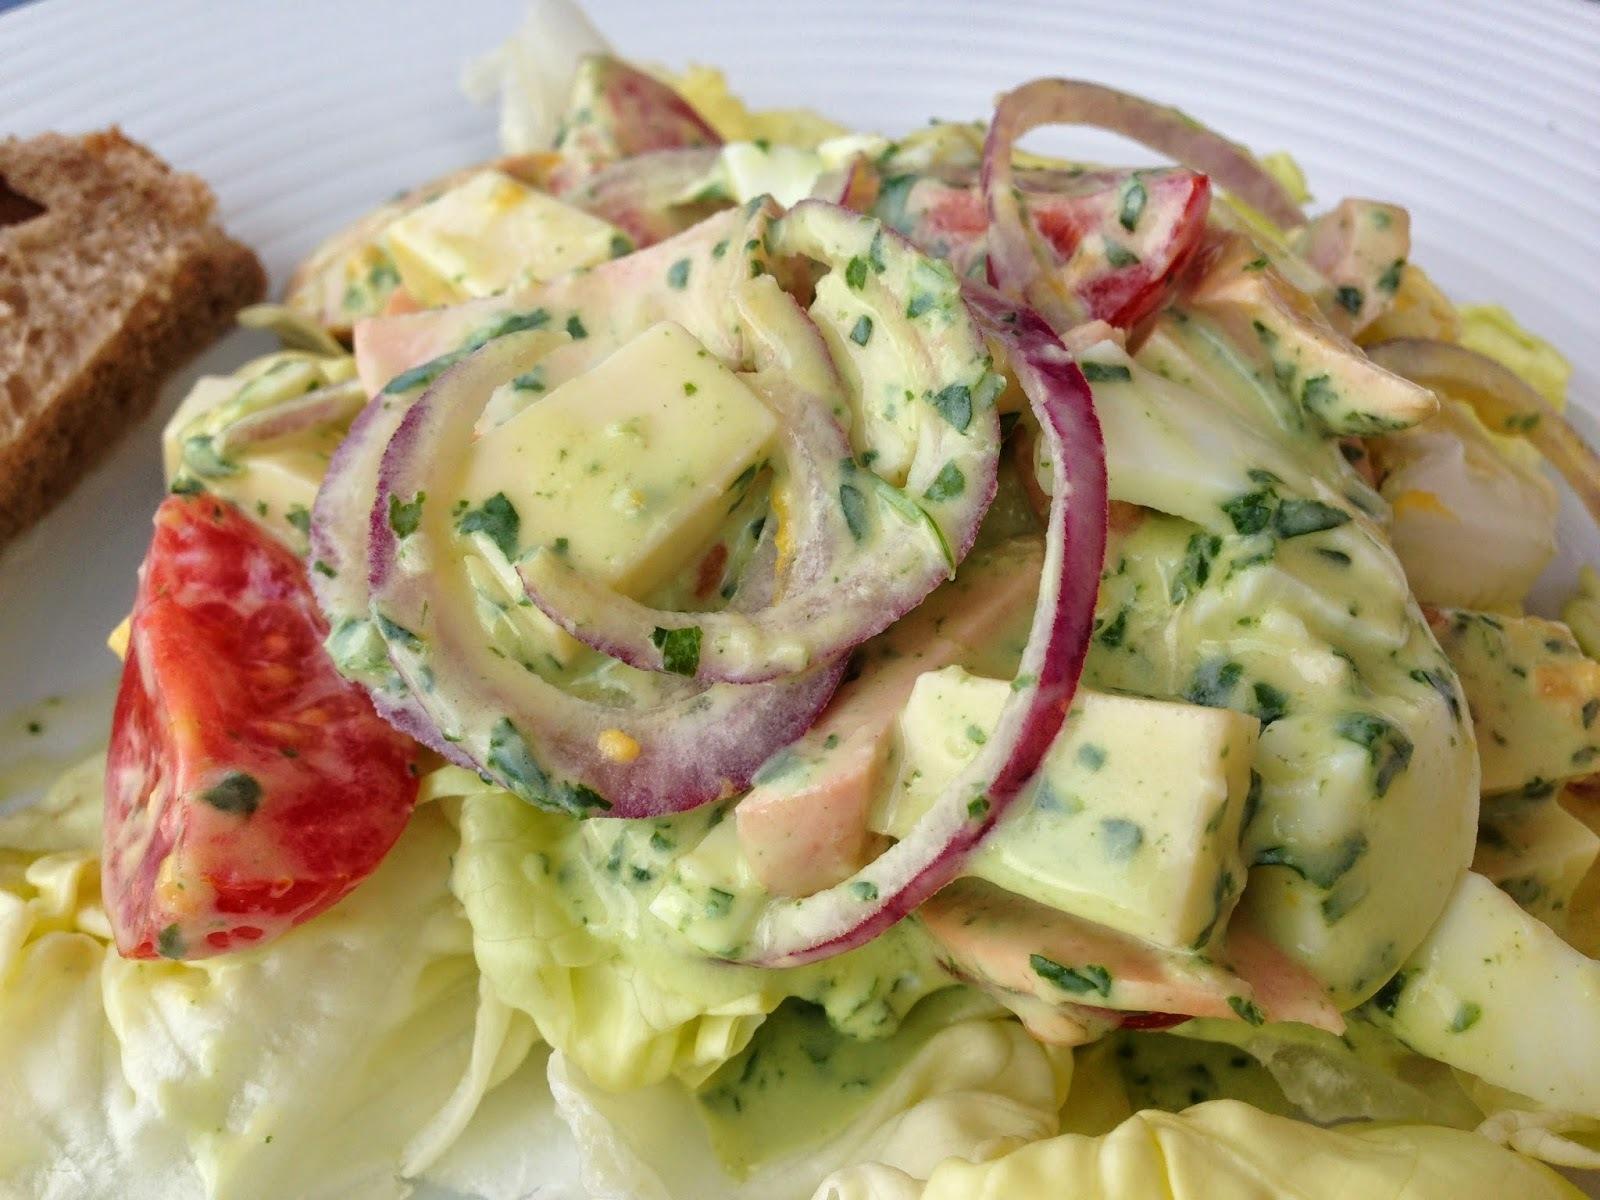 Cervelat-Salat oder Wurst-Käse-Salat